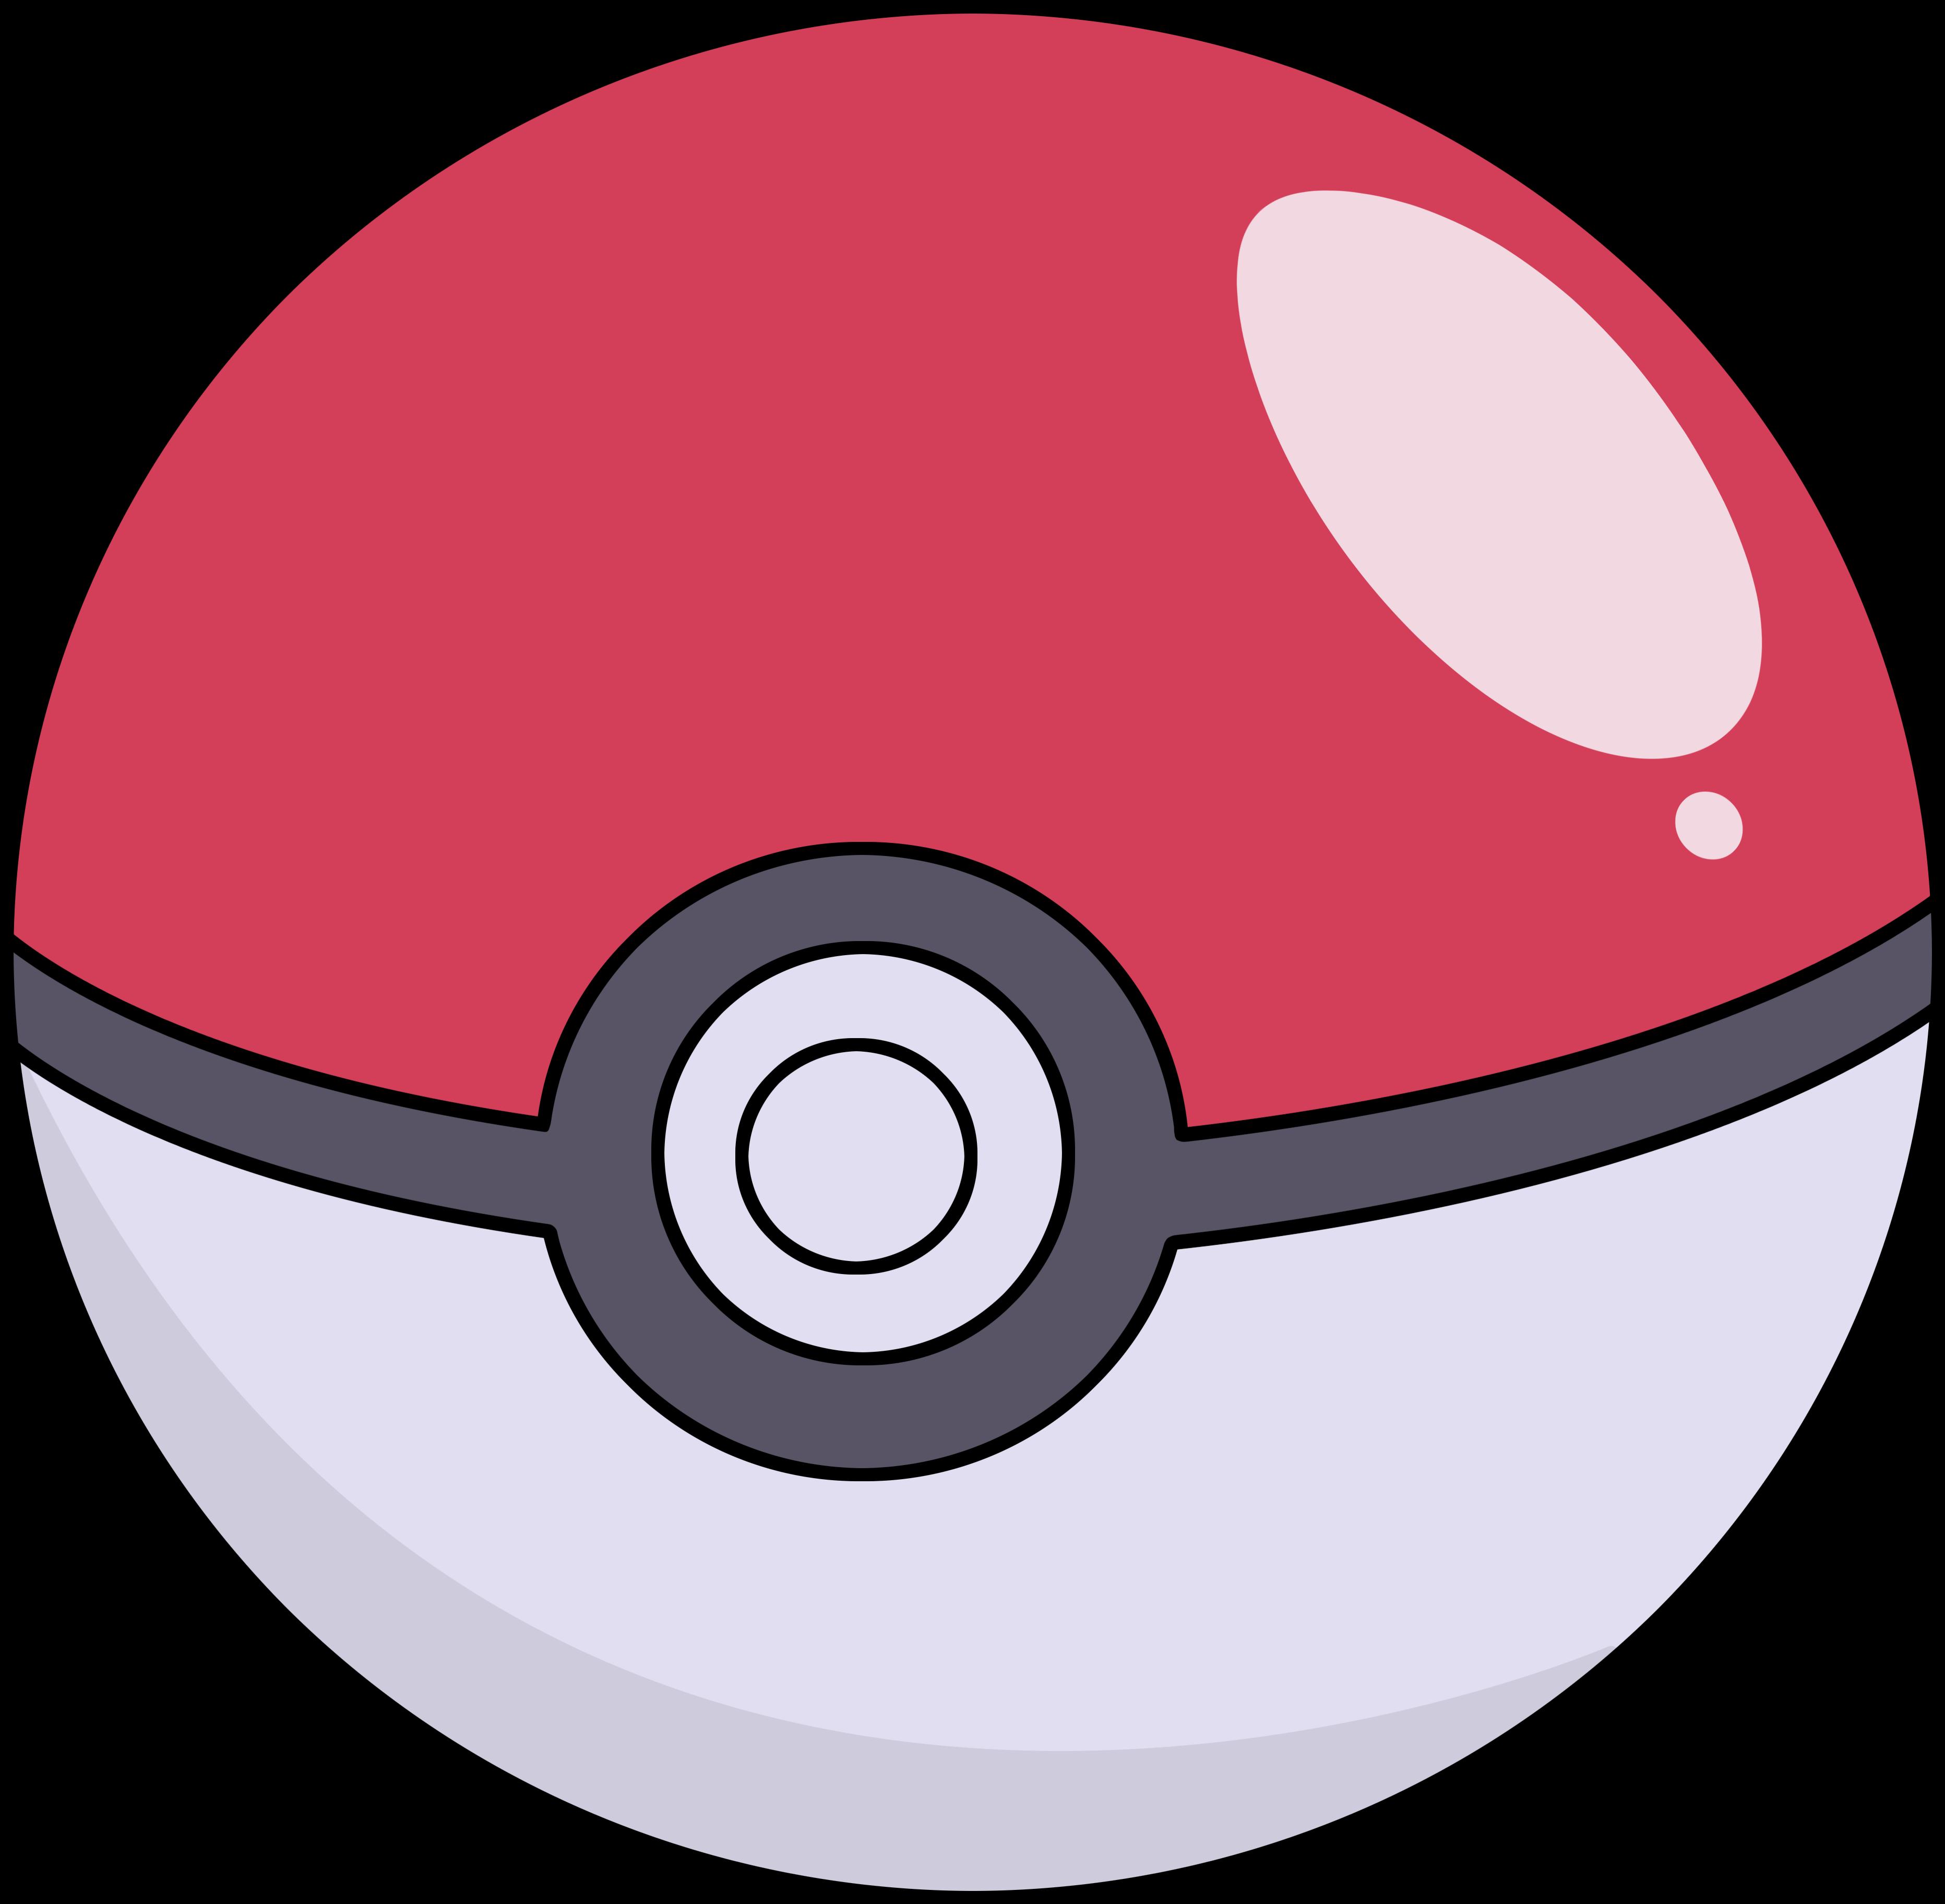 Pokemon Go Clipart Pokeball - Png Download - Full Size ...